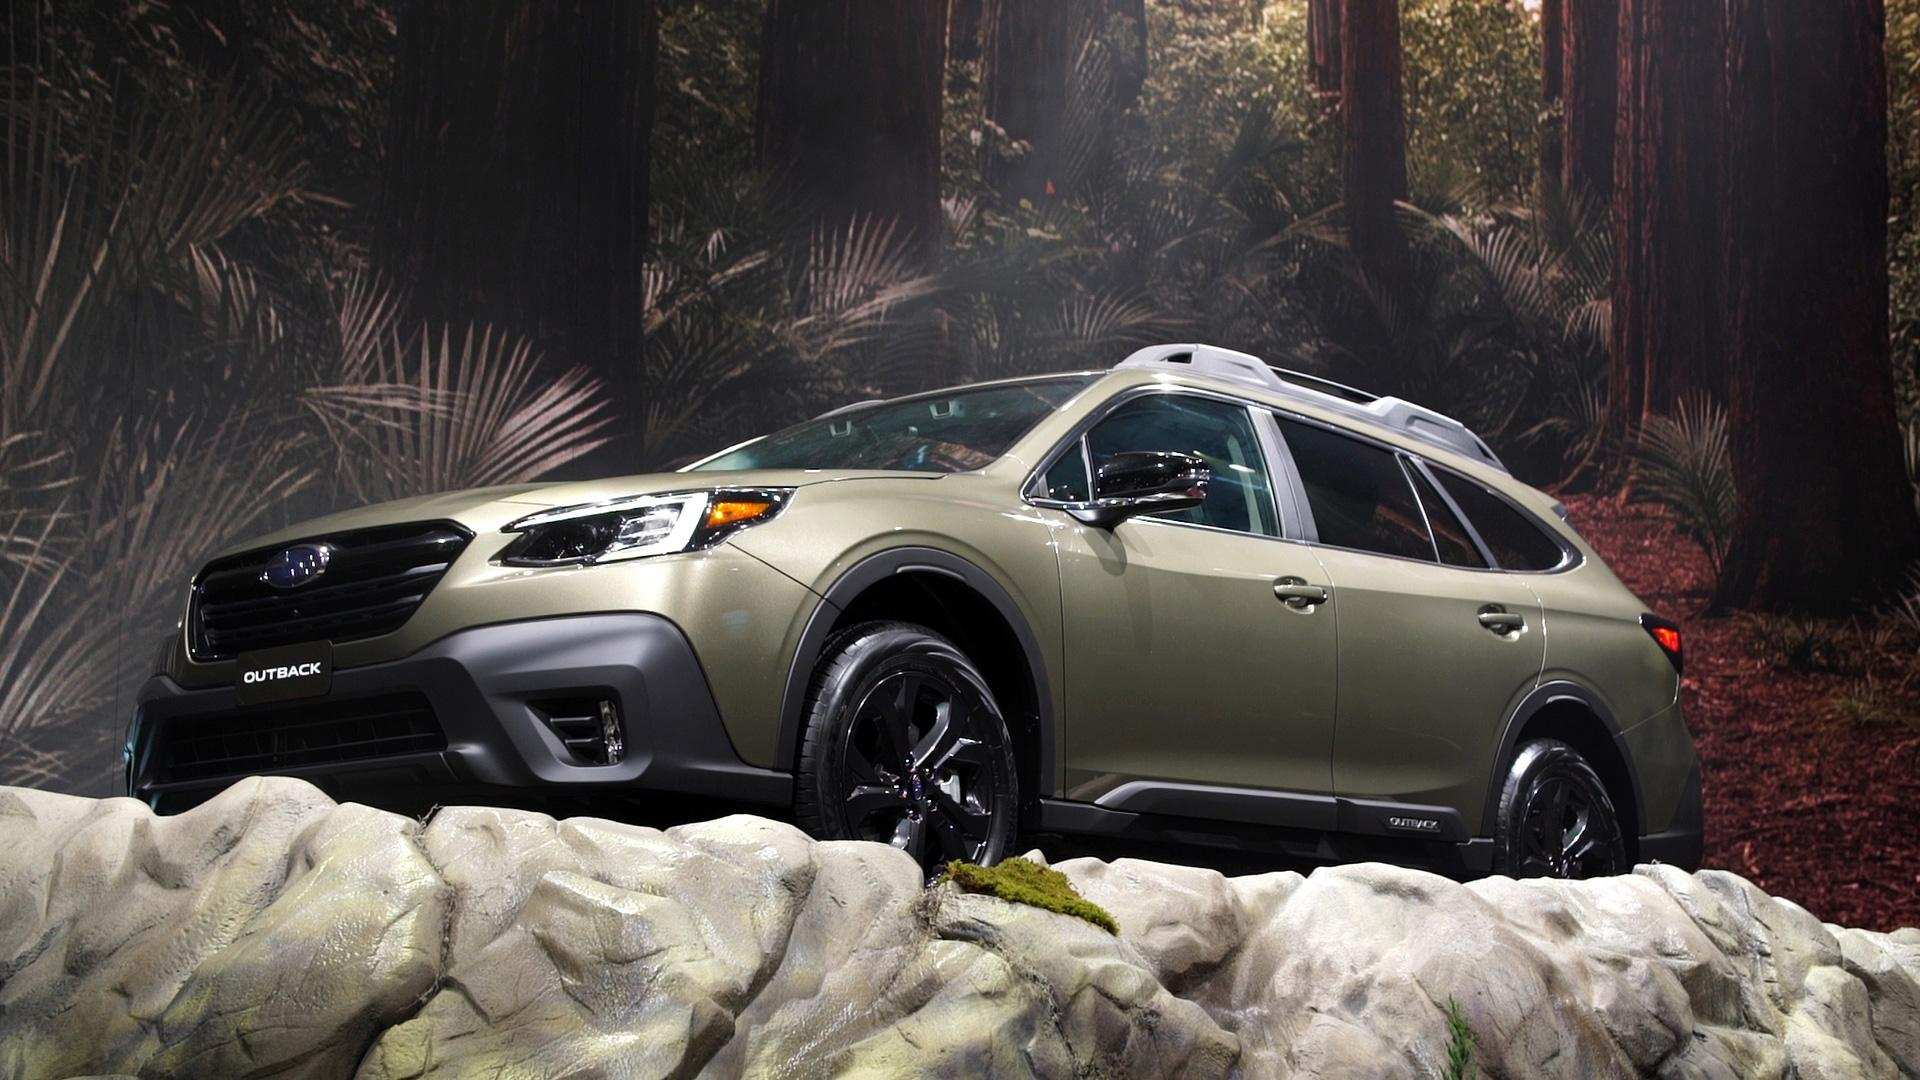 33 Great Subaru Outback 2020 Ratings for Subaru Outback 2020